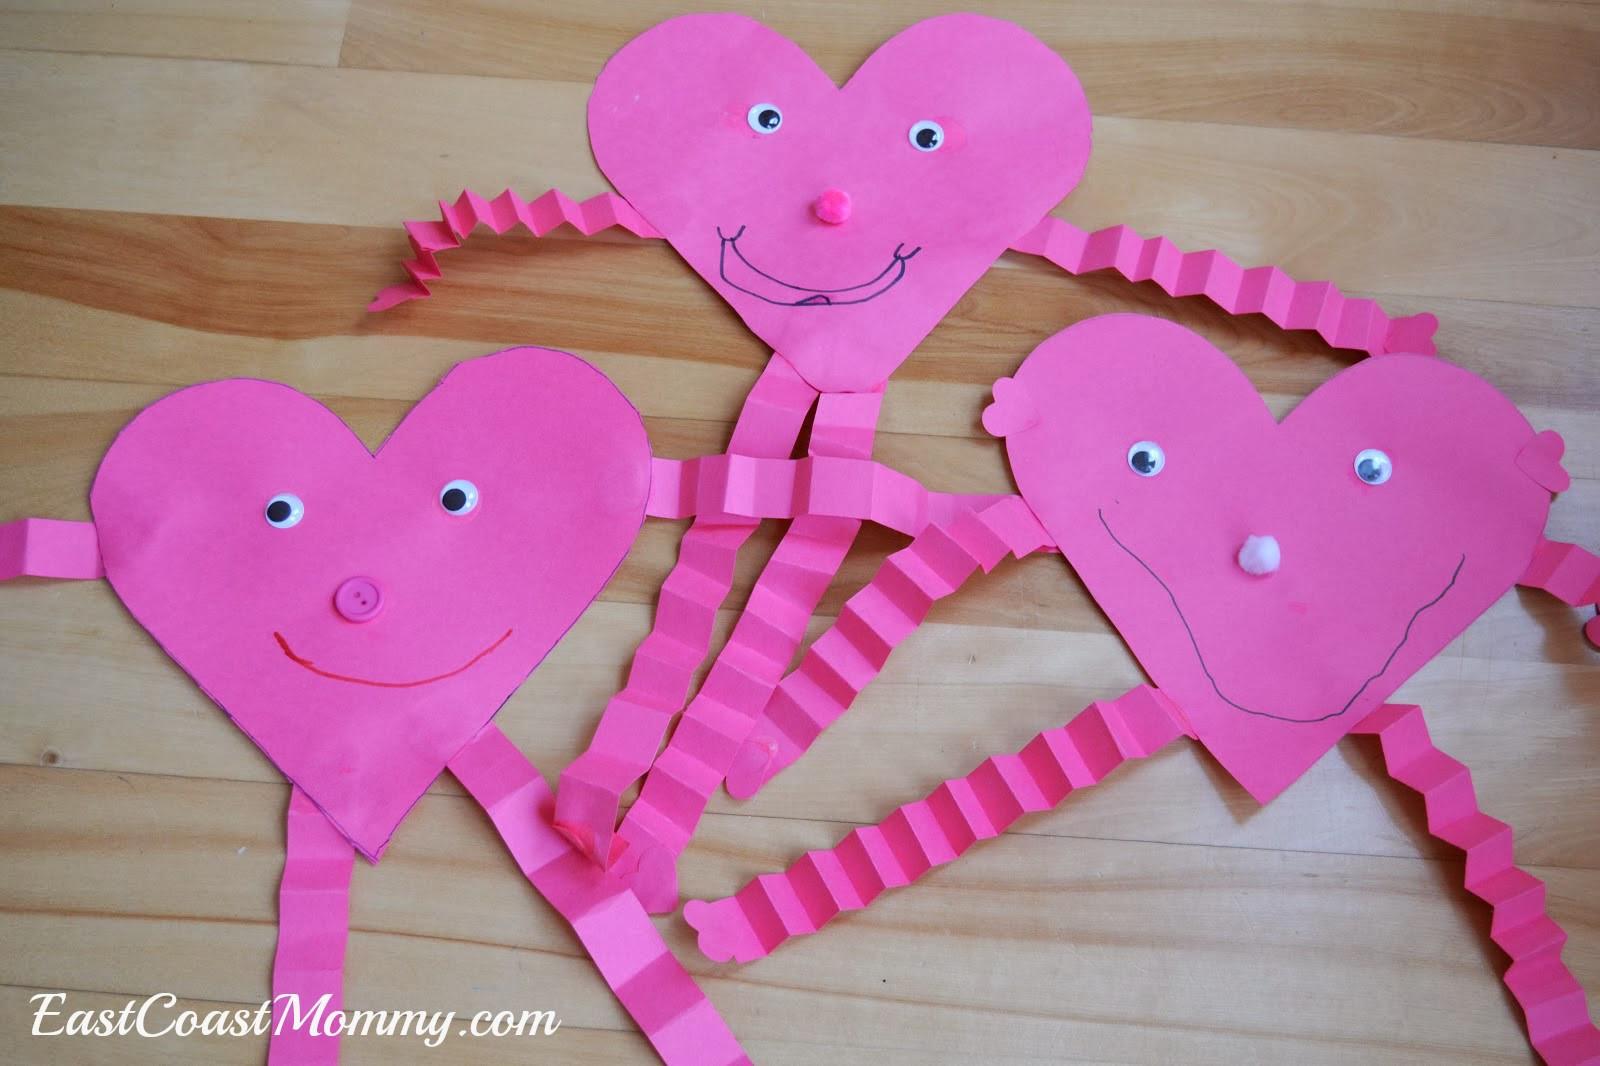 Heart Craft Ideas For Preschoolers  East Coast Mommy Preschool Craft Heart Person